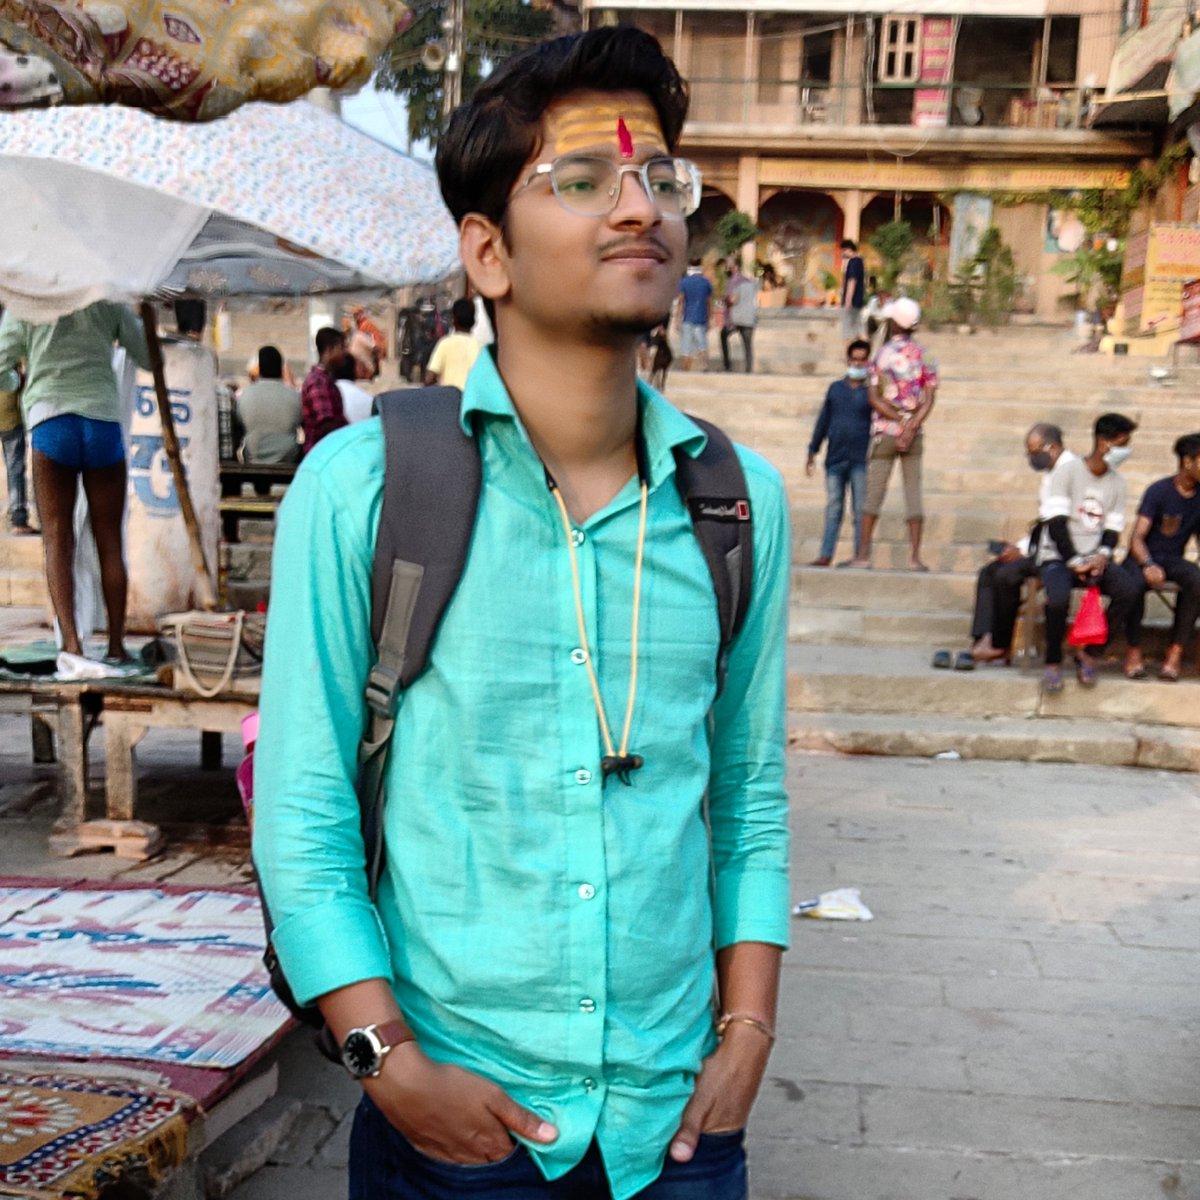 #NewProfilePic2020 #kashi #Varanasi #Hinduism #GANGA #India https://t.co/9uZKY2Unm7